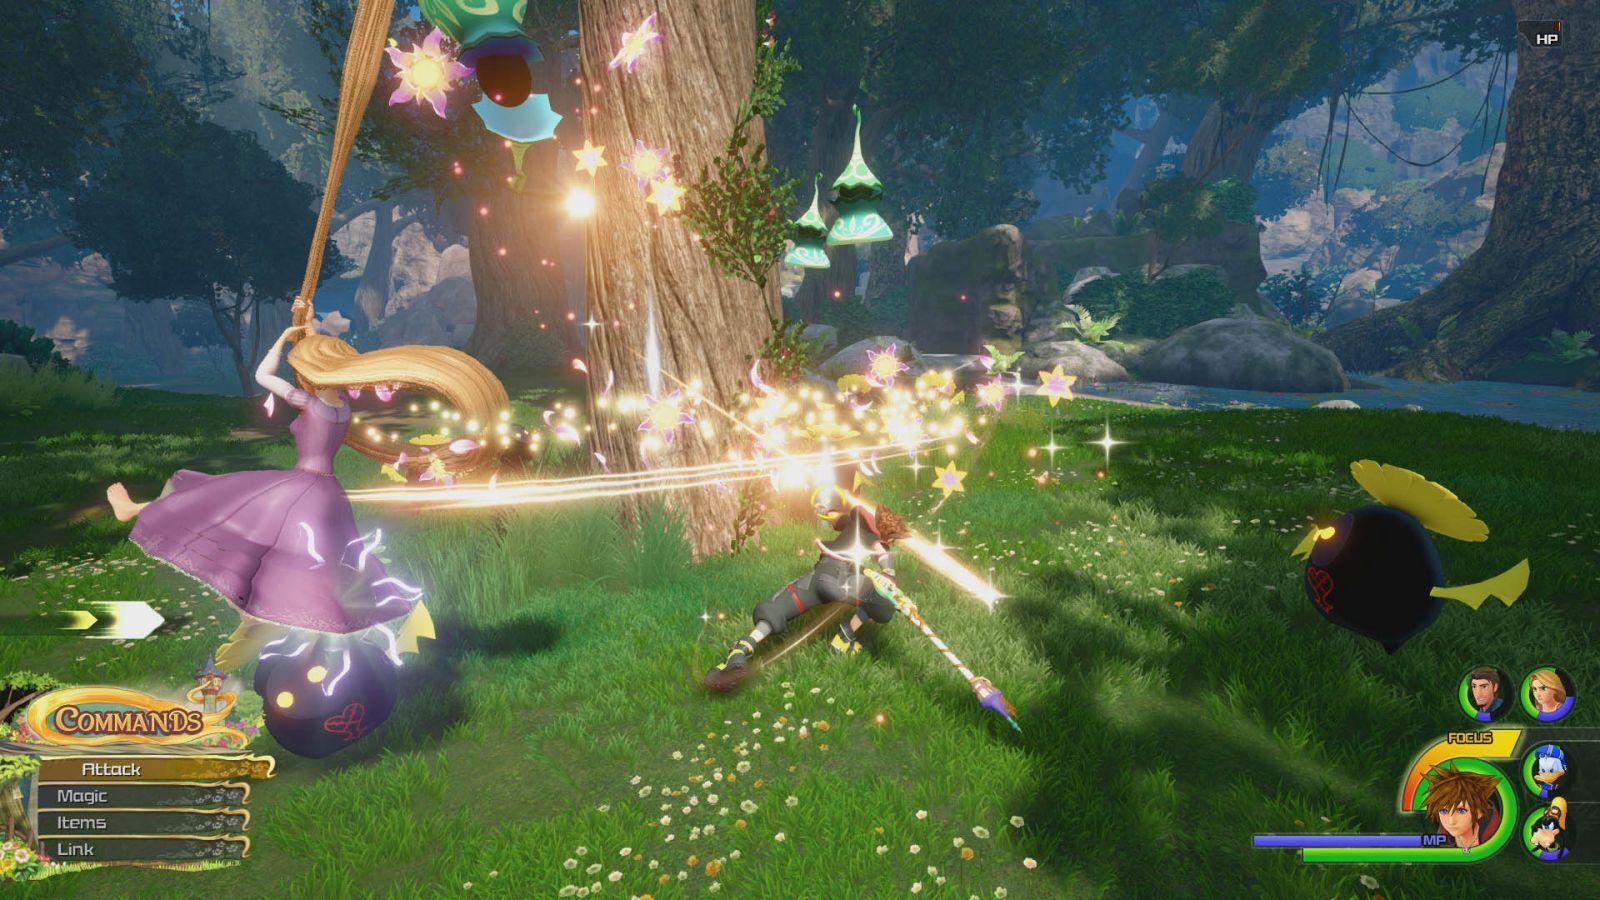 Kingdom Hearts 3 has a dream: Tangled gameplay trailer